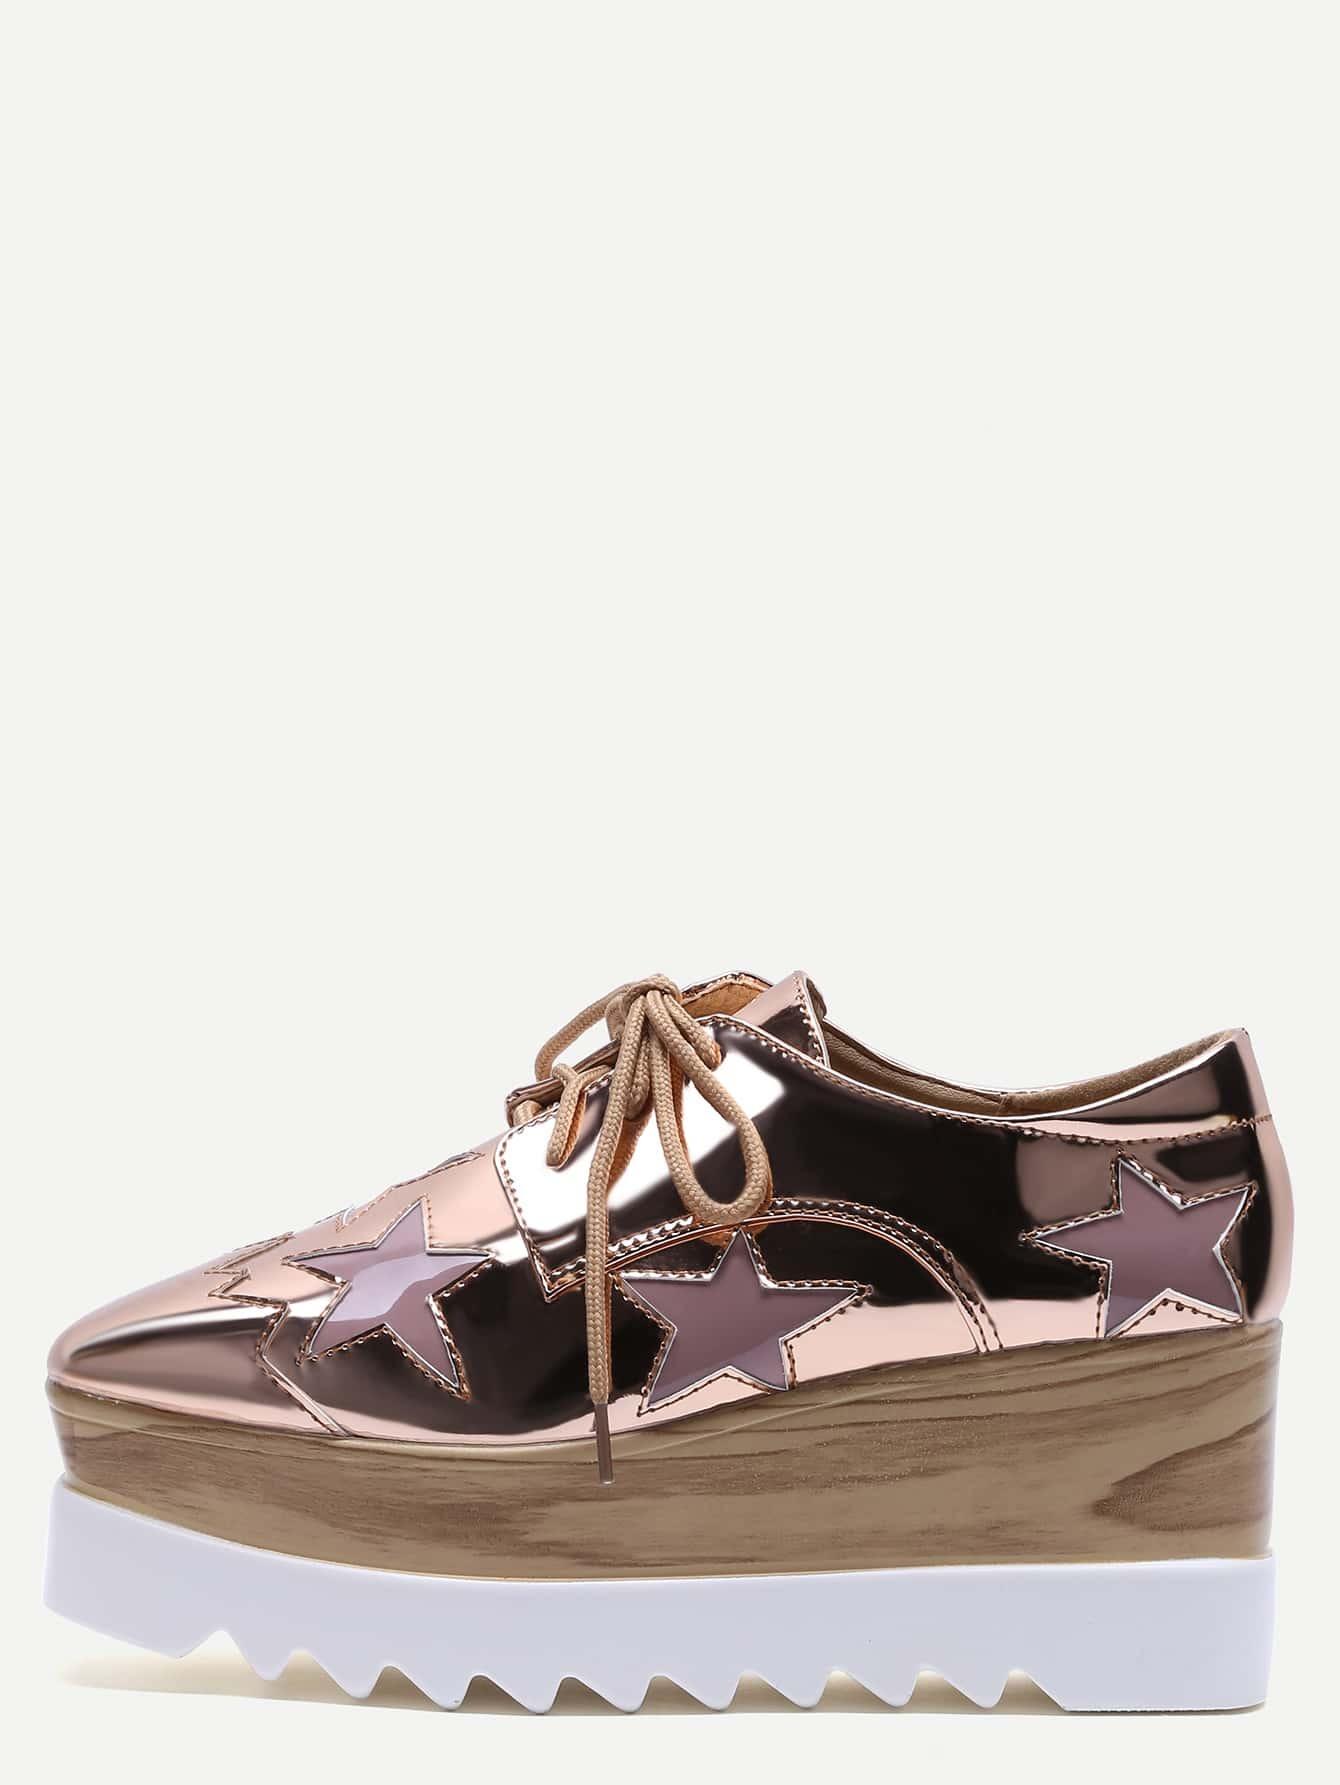 Rose Gold Star Patch Patent Leather Platform Shoes EmmaCloth-Women ... f53183e5af80